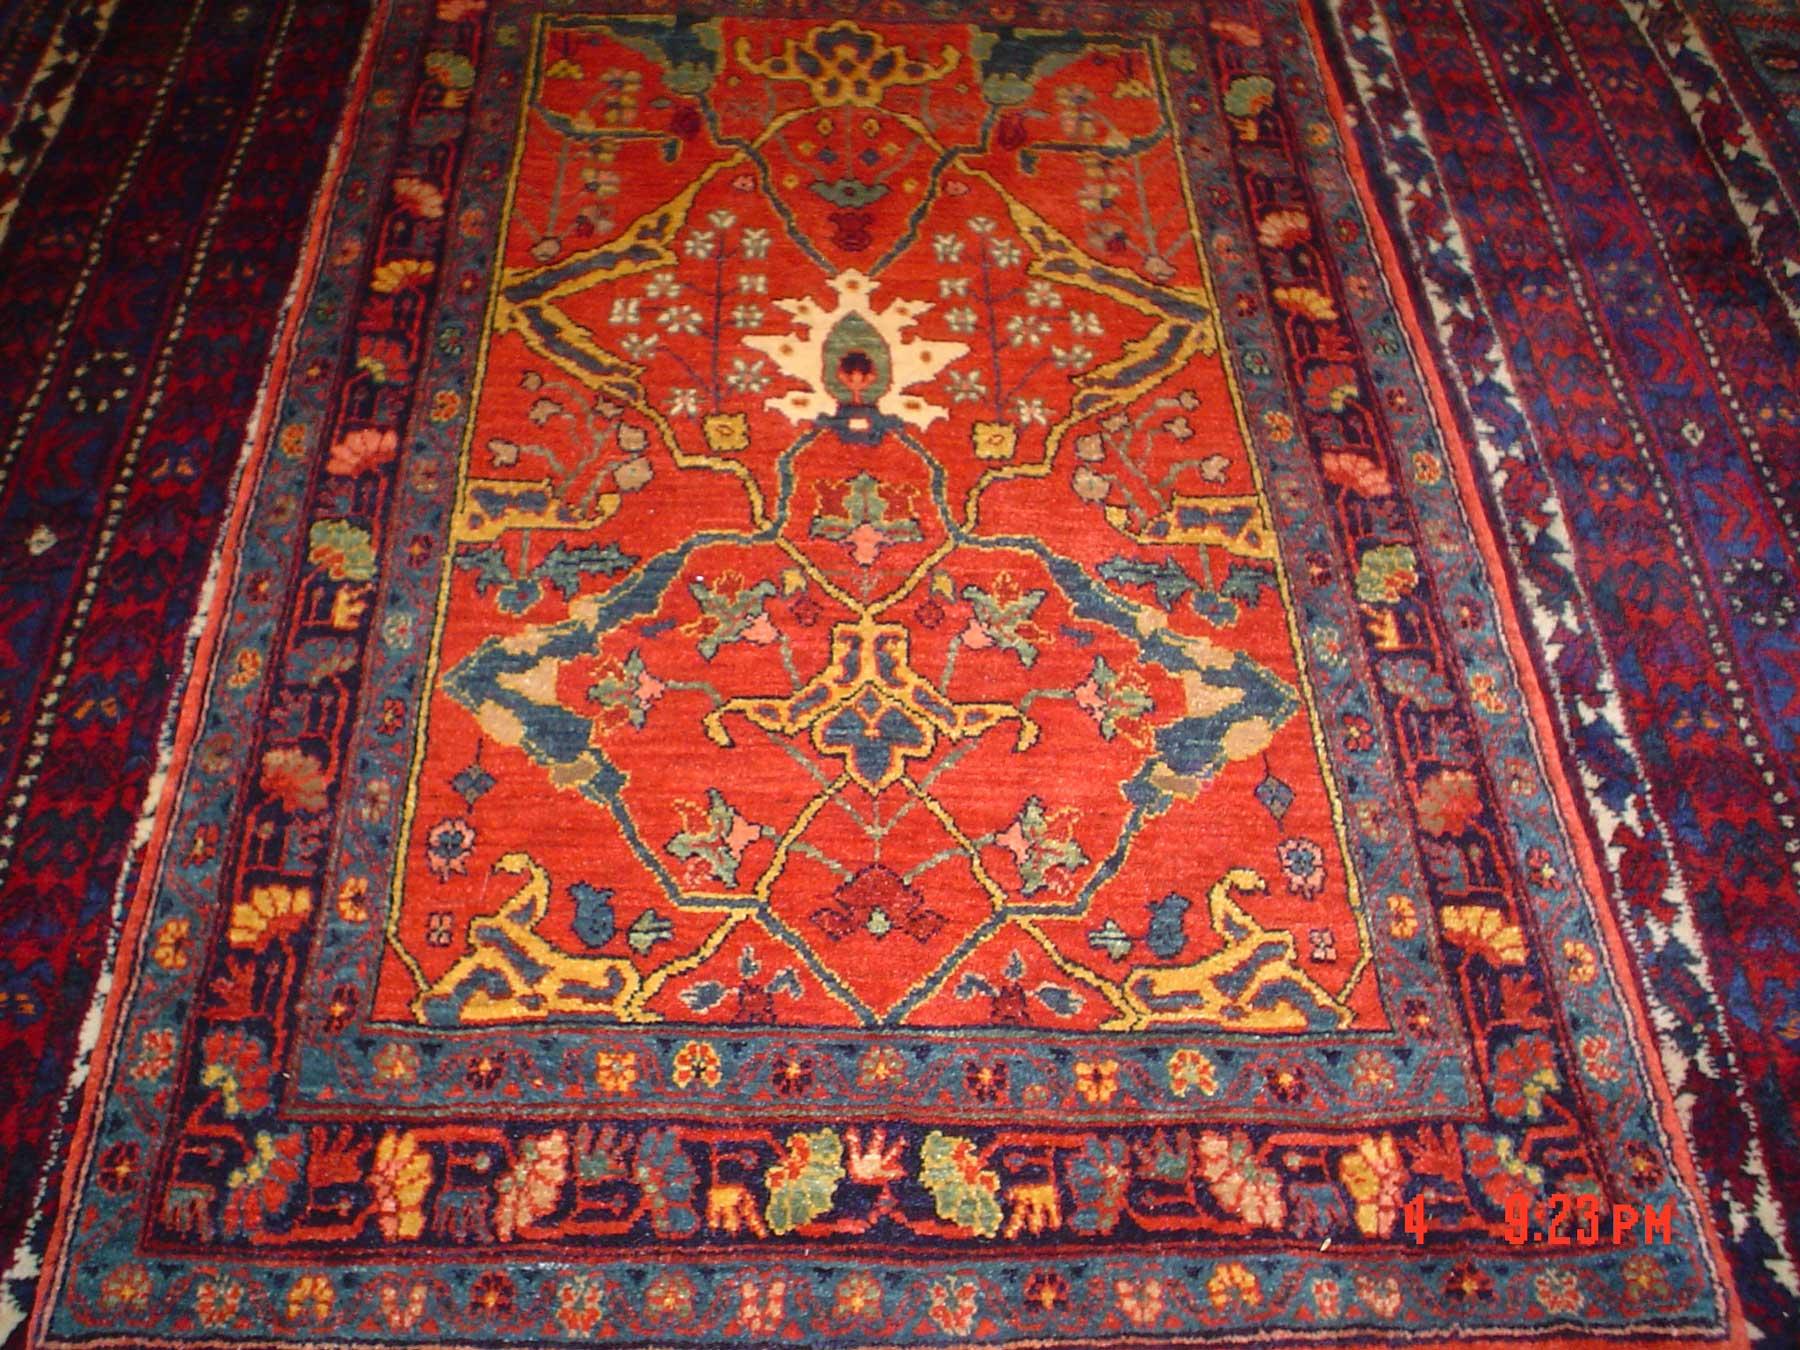 3 x 5 Persian Bijar rug. Woven by Kurdish weavers in Iran. Sold.